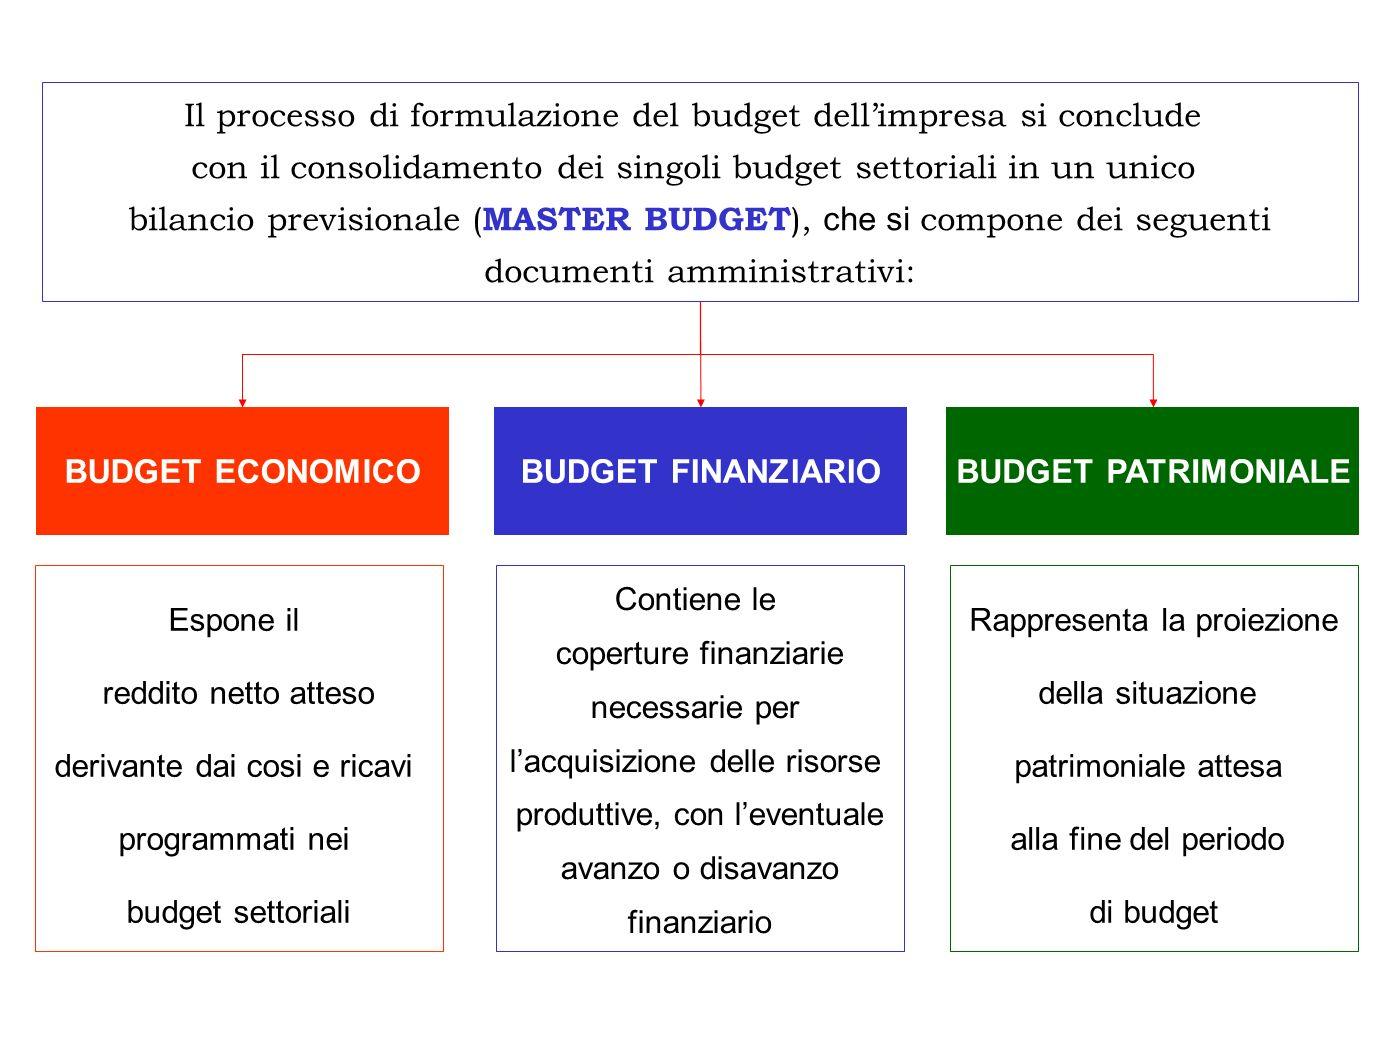 BUDGET ECONOMICO BUDGET FINANZIARIO BUDGET PATRIMONIALE